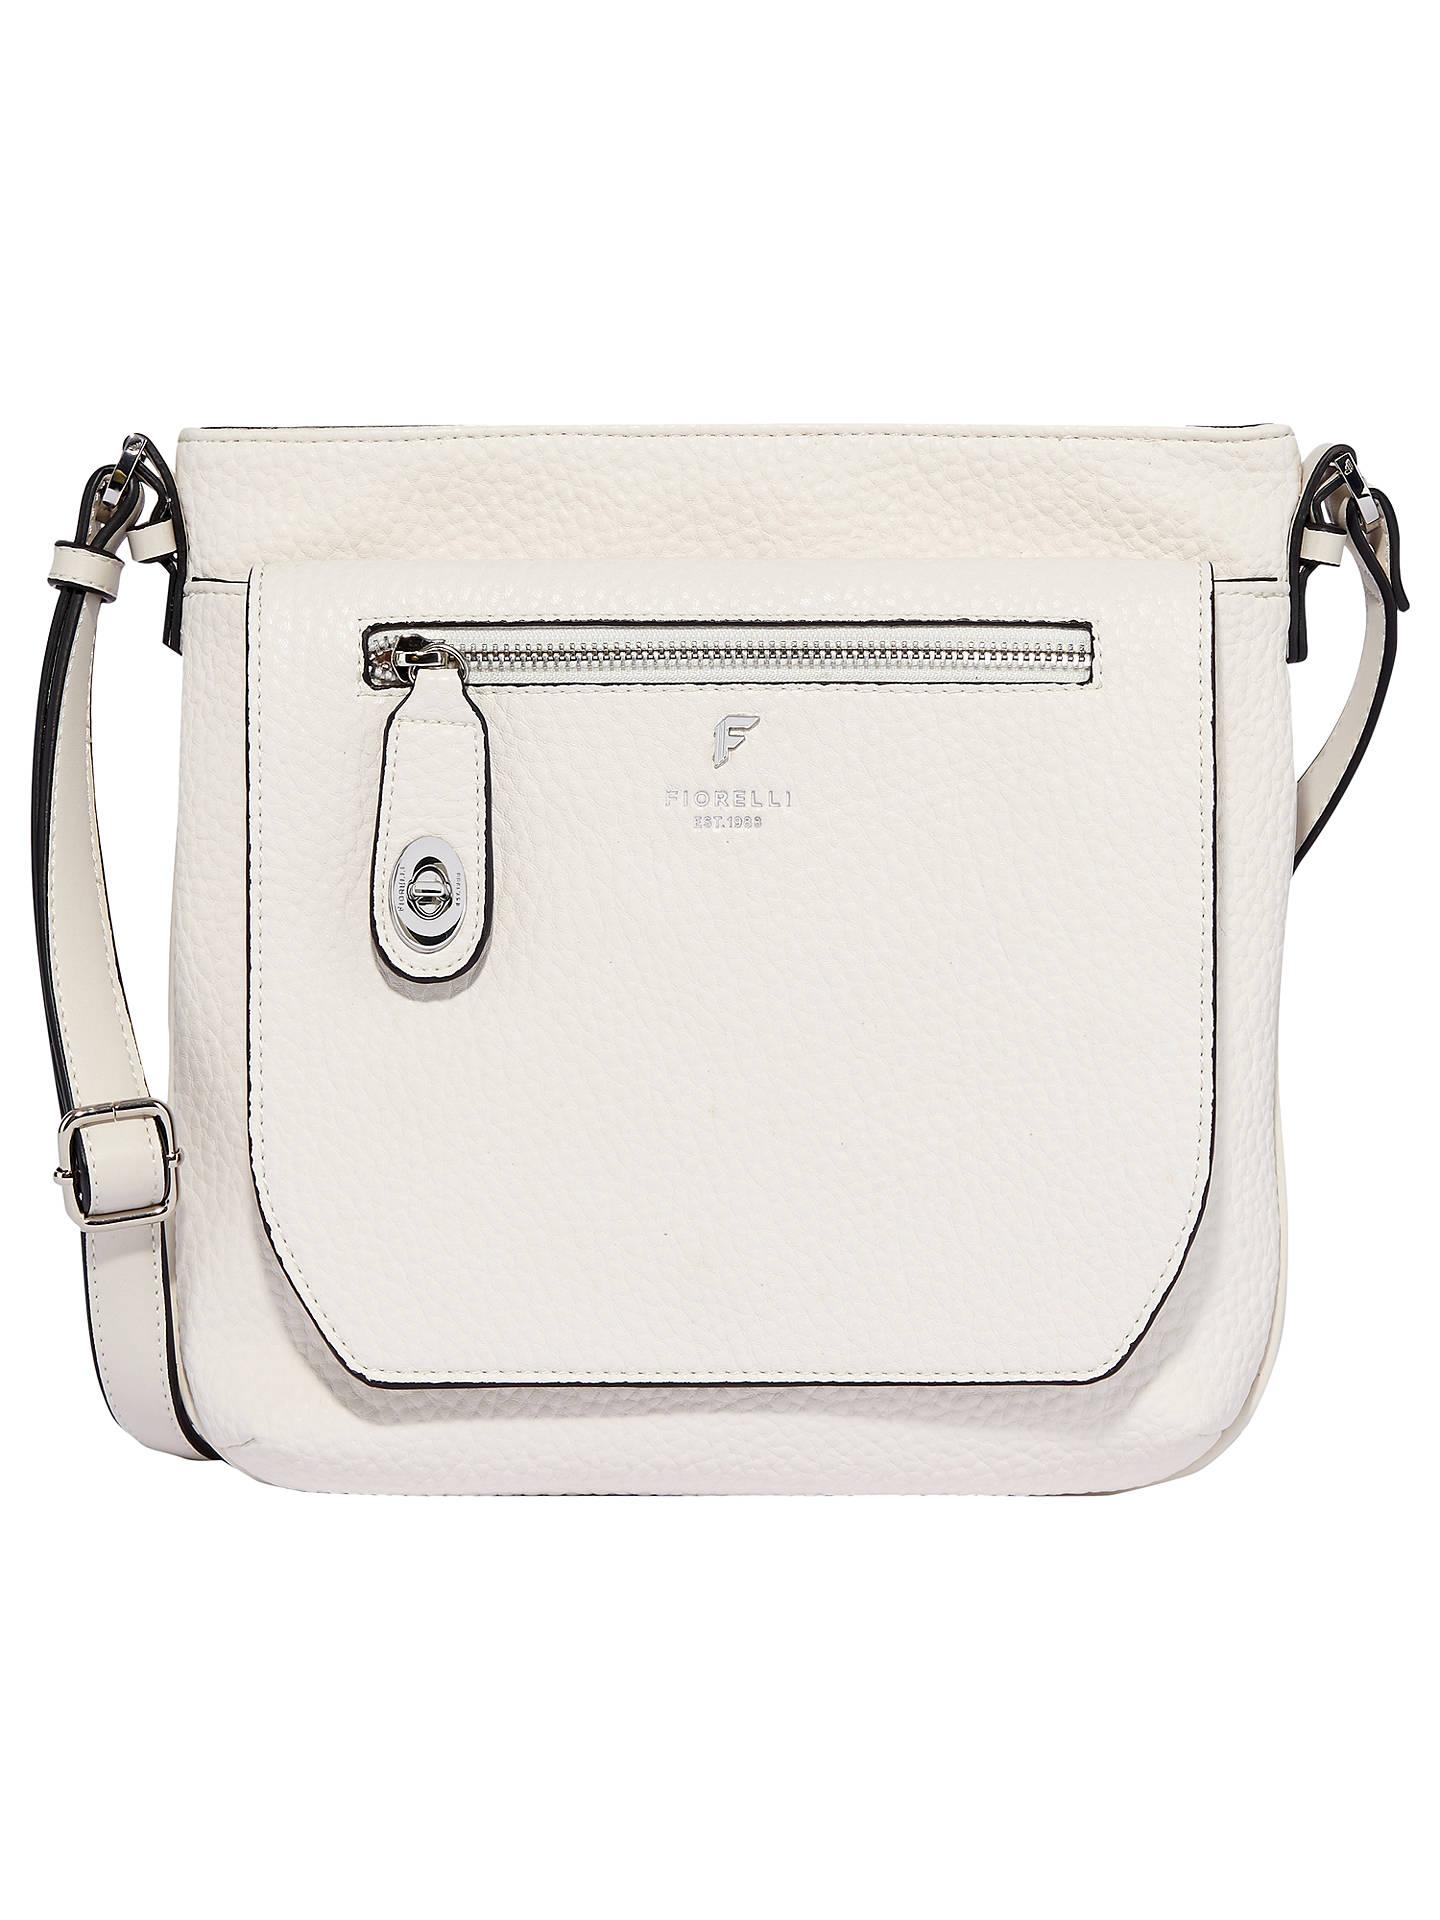 BuyFiorelli Jenson Cross Body Bag f76b67bc90716